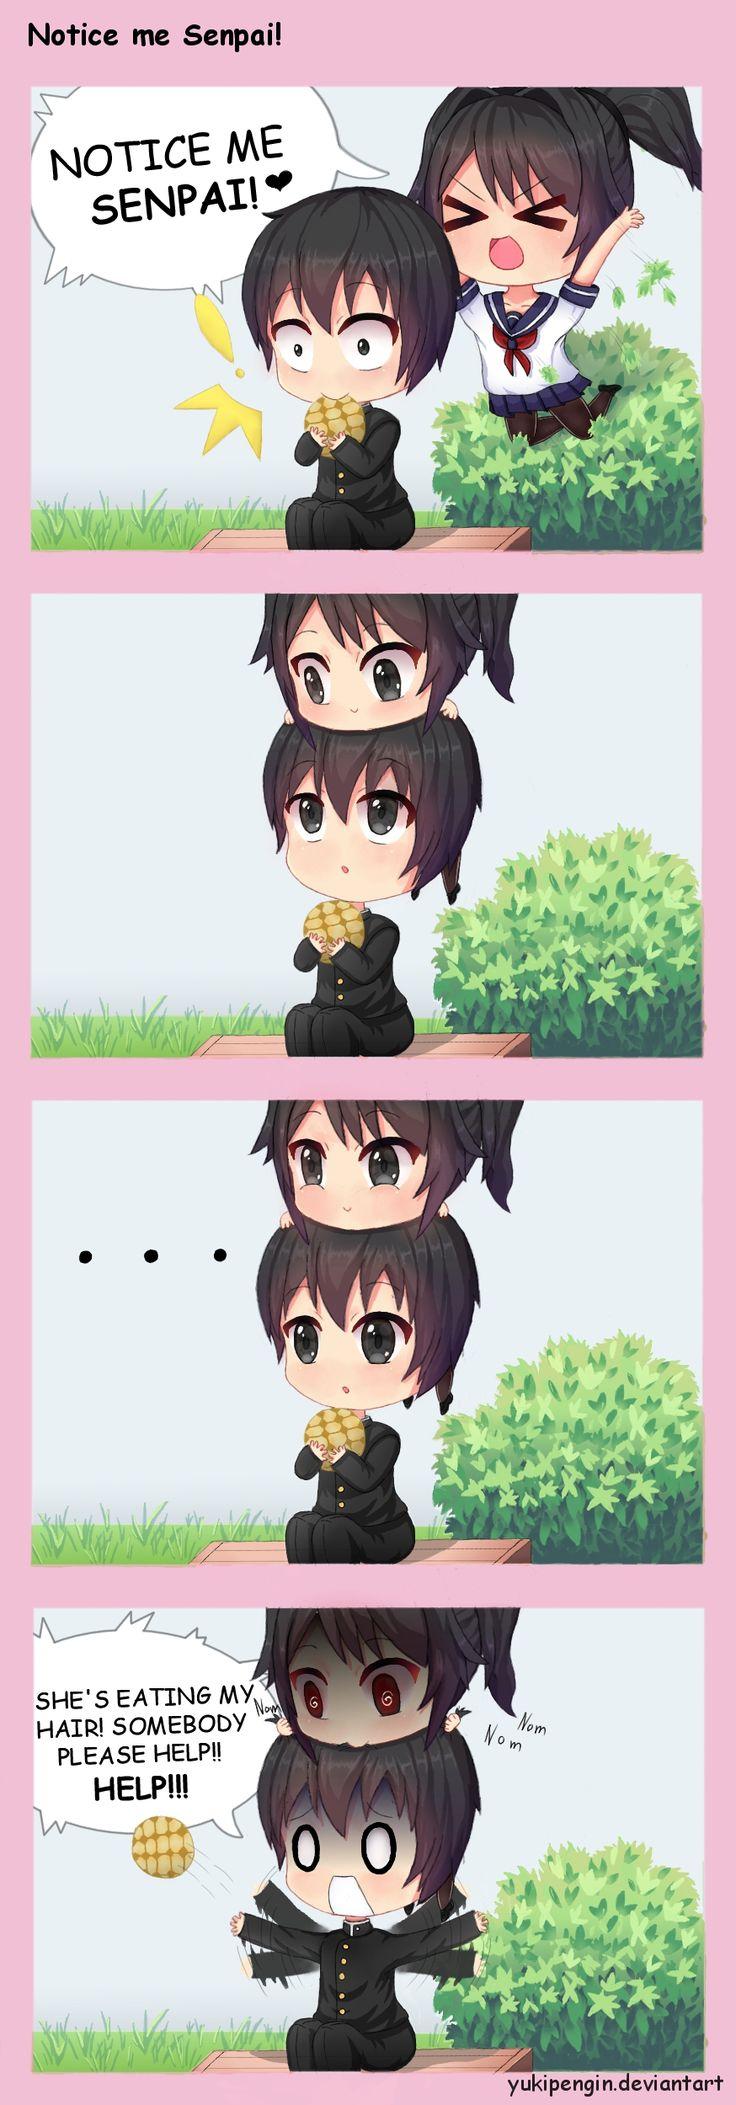 Notice me Senpai! by Yukipengin on DeviantArt